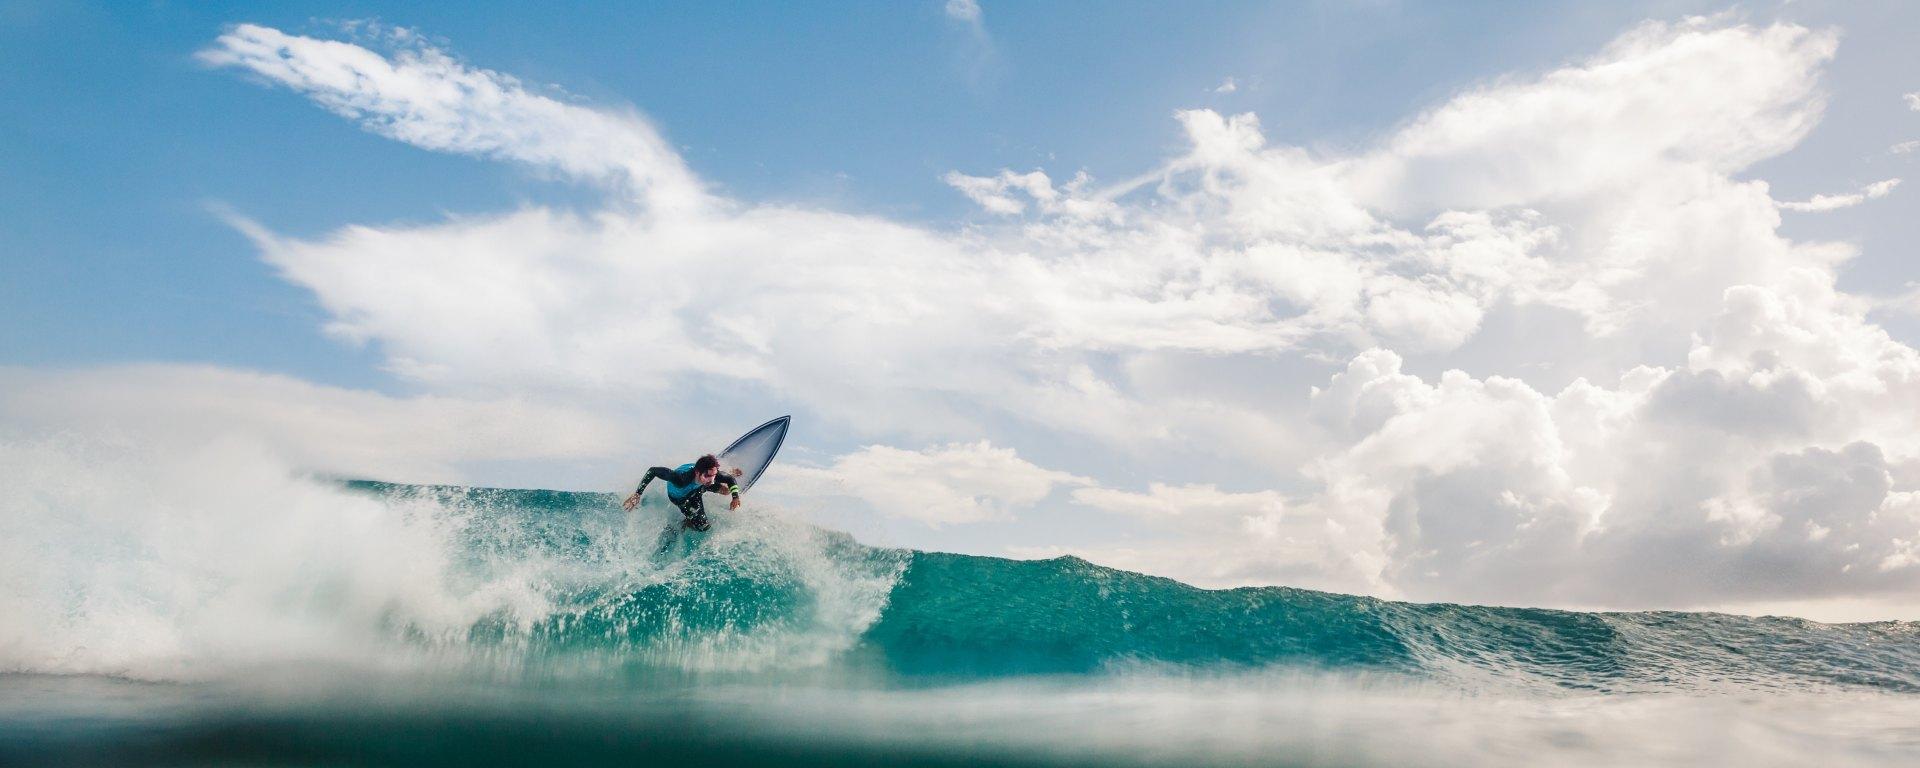 man surfing large wave in ocean